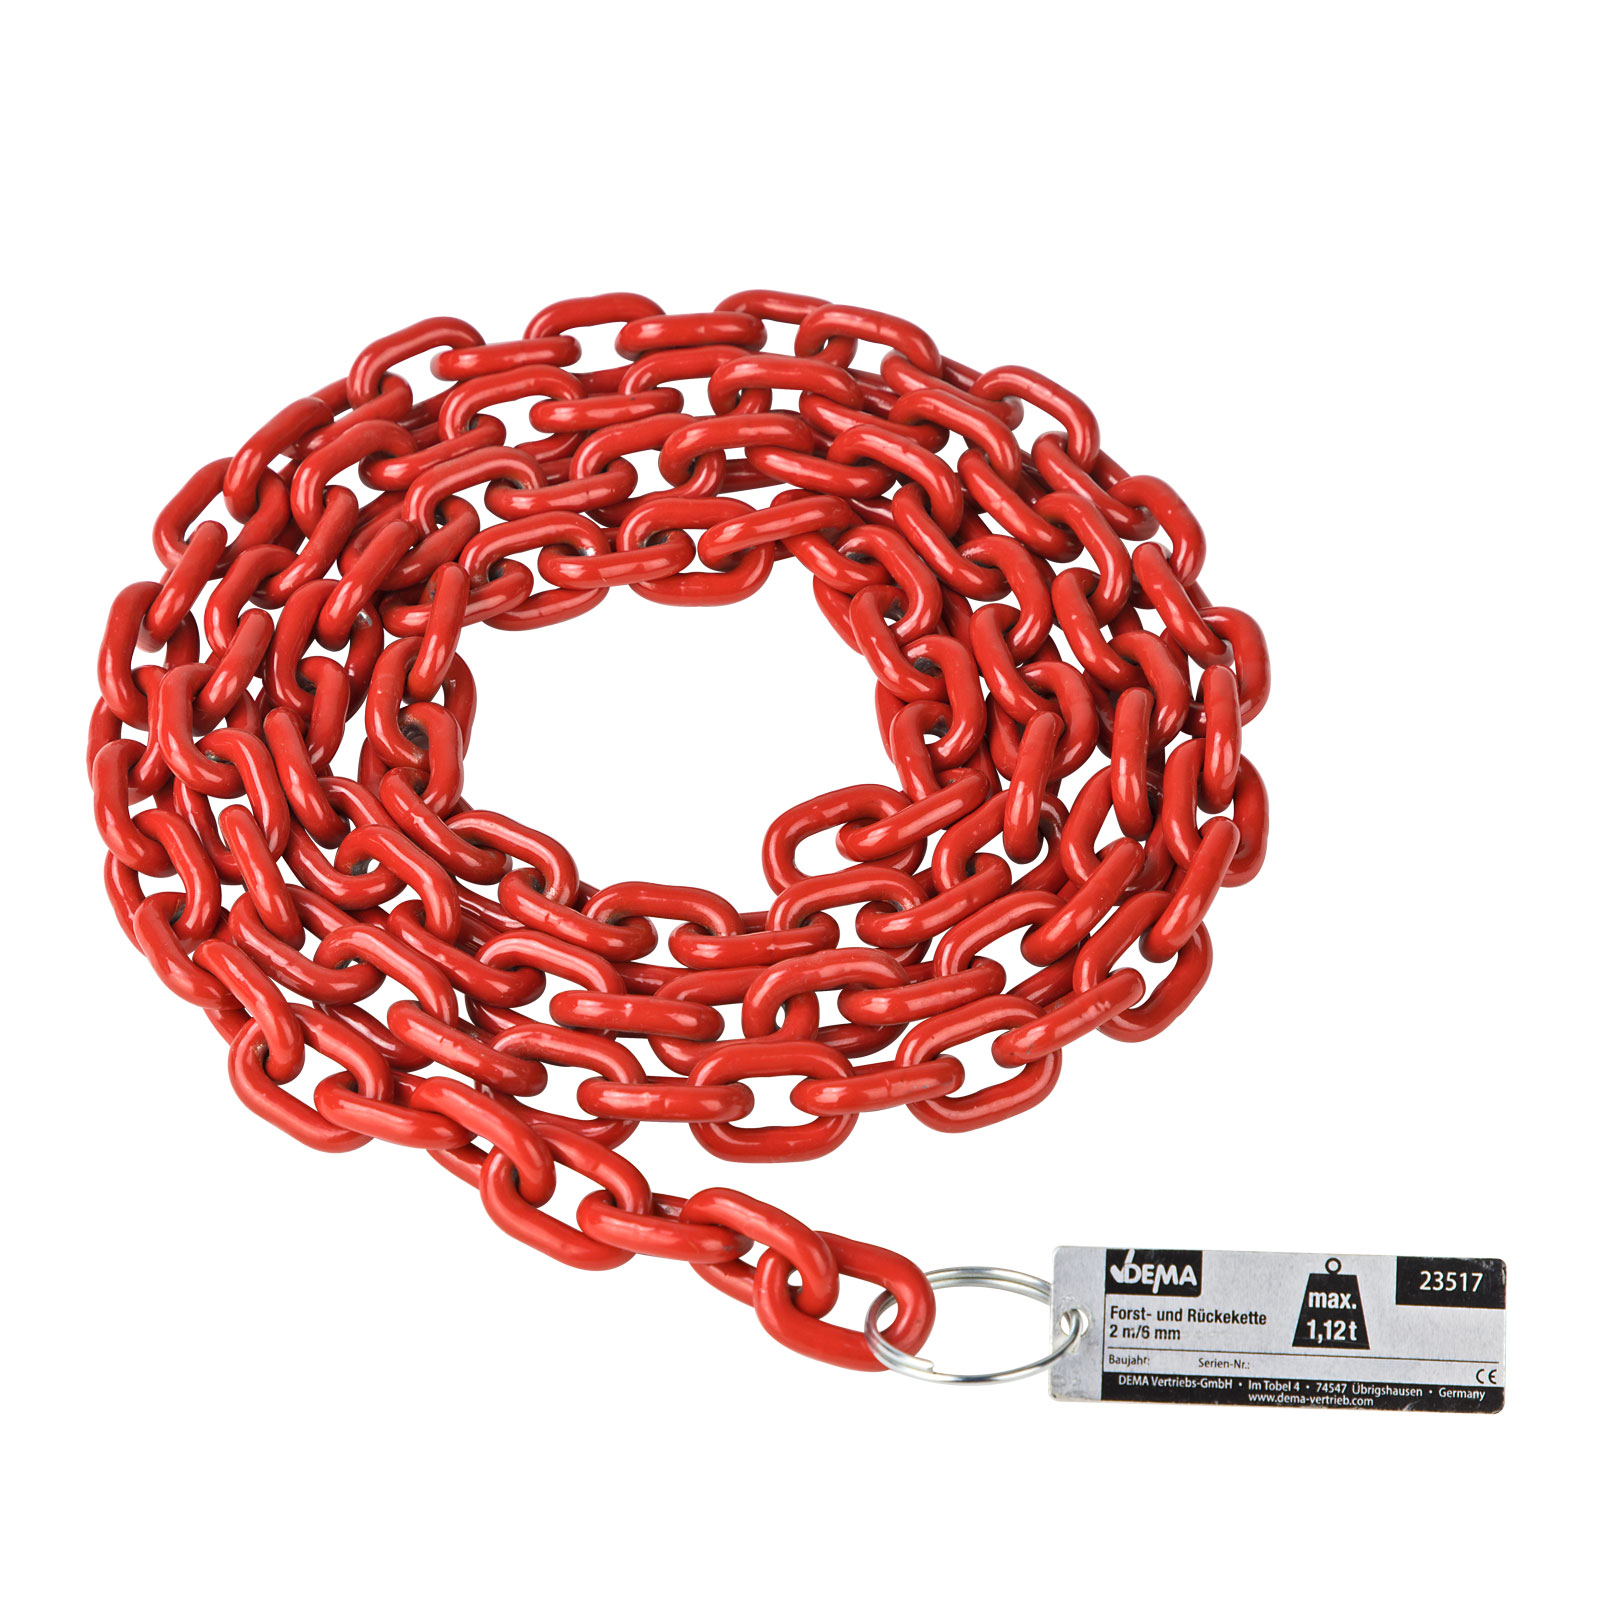 Dema Stahl Forstkette Rückekette 2m 6mm 1,12t rot Güteklasse 8 23517